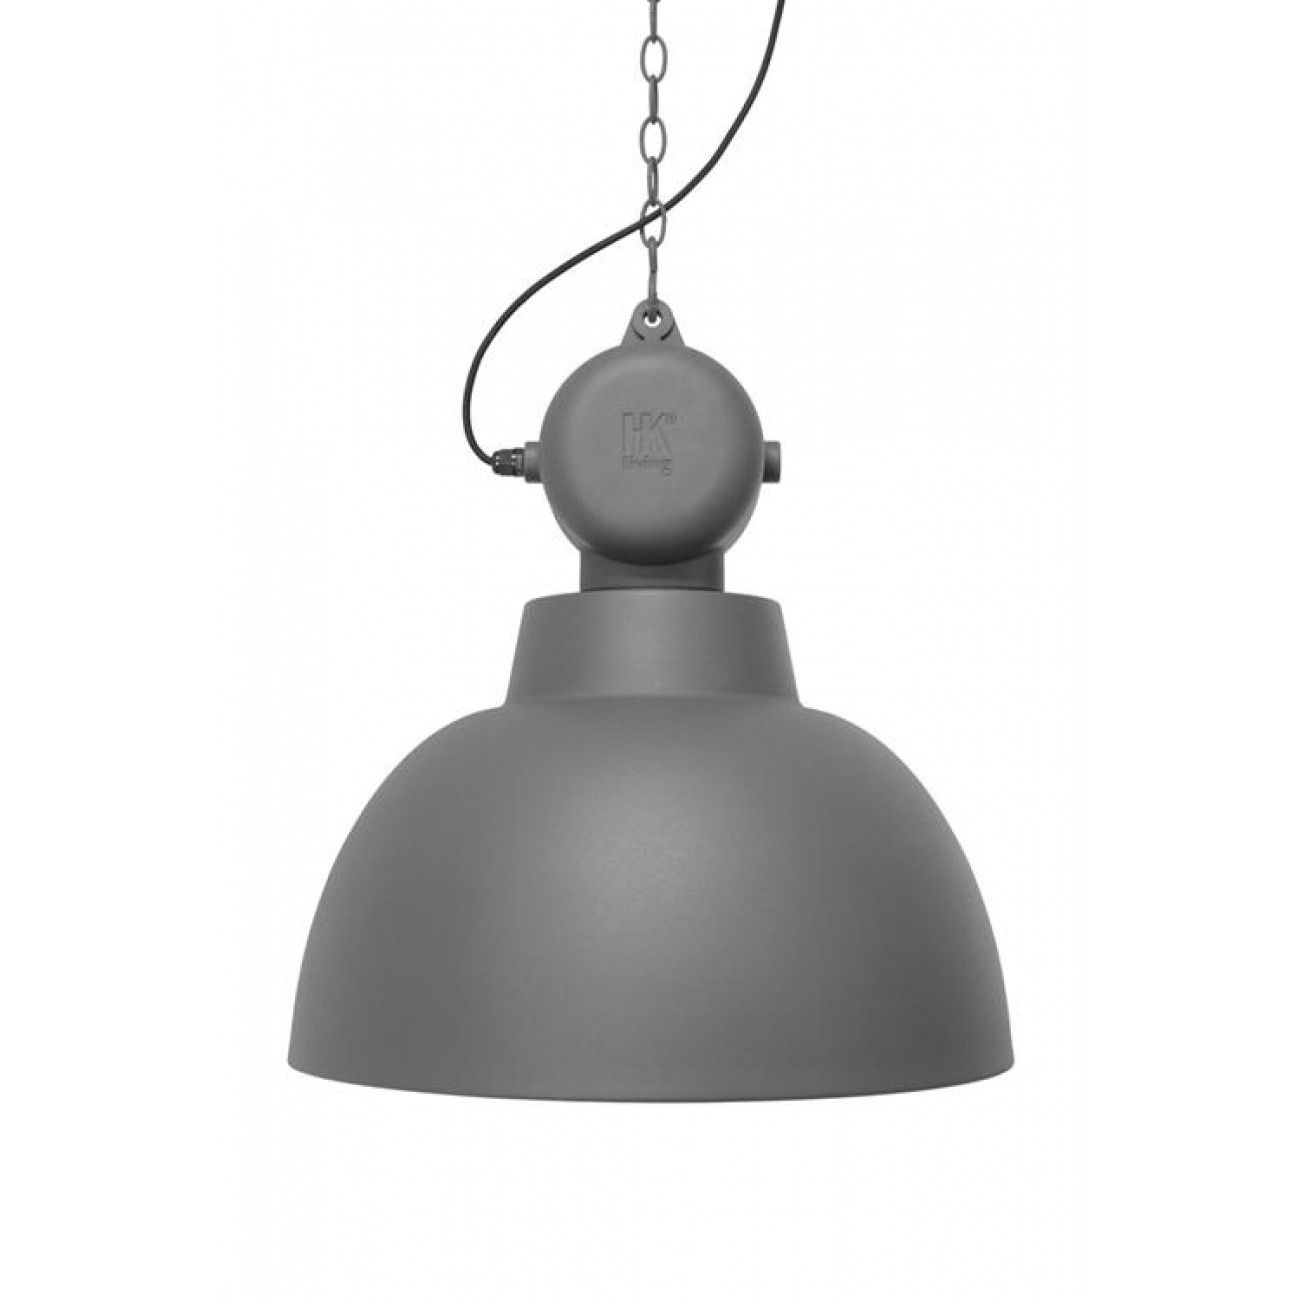 Hängeleuchte Fabrikart, Pendelleuchte grau-matt, Lampe Industriedesign, Ø 40 cm